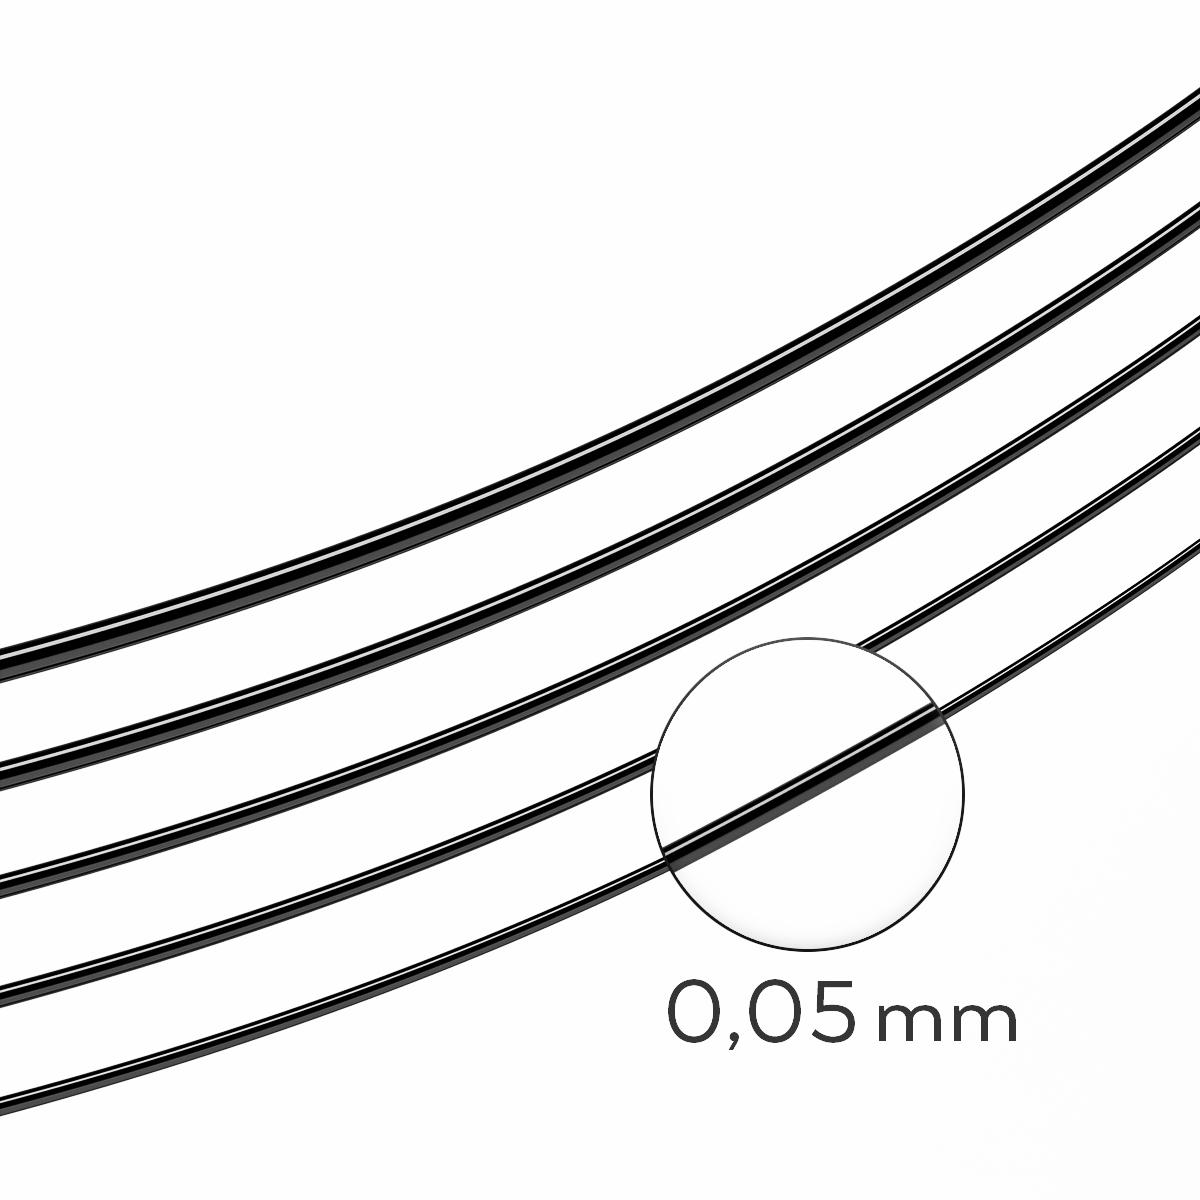 rzesy-objetosciowe-silk-black-d-0-05